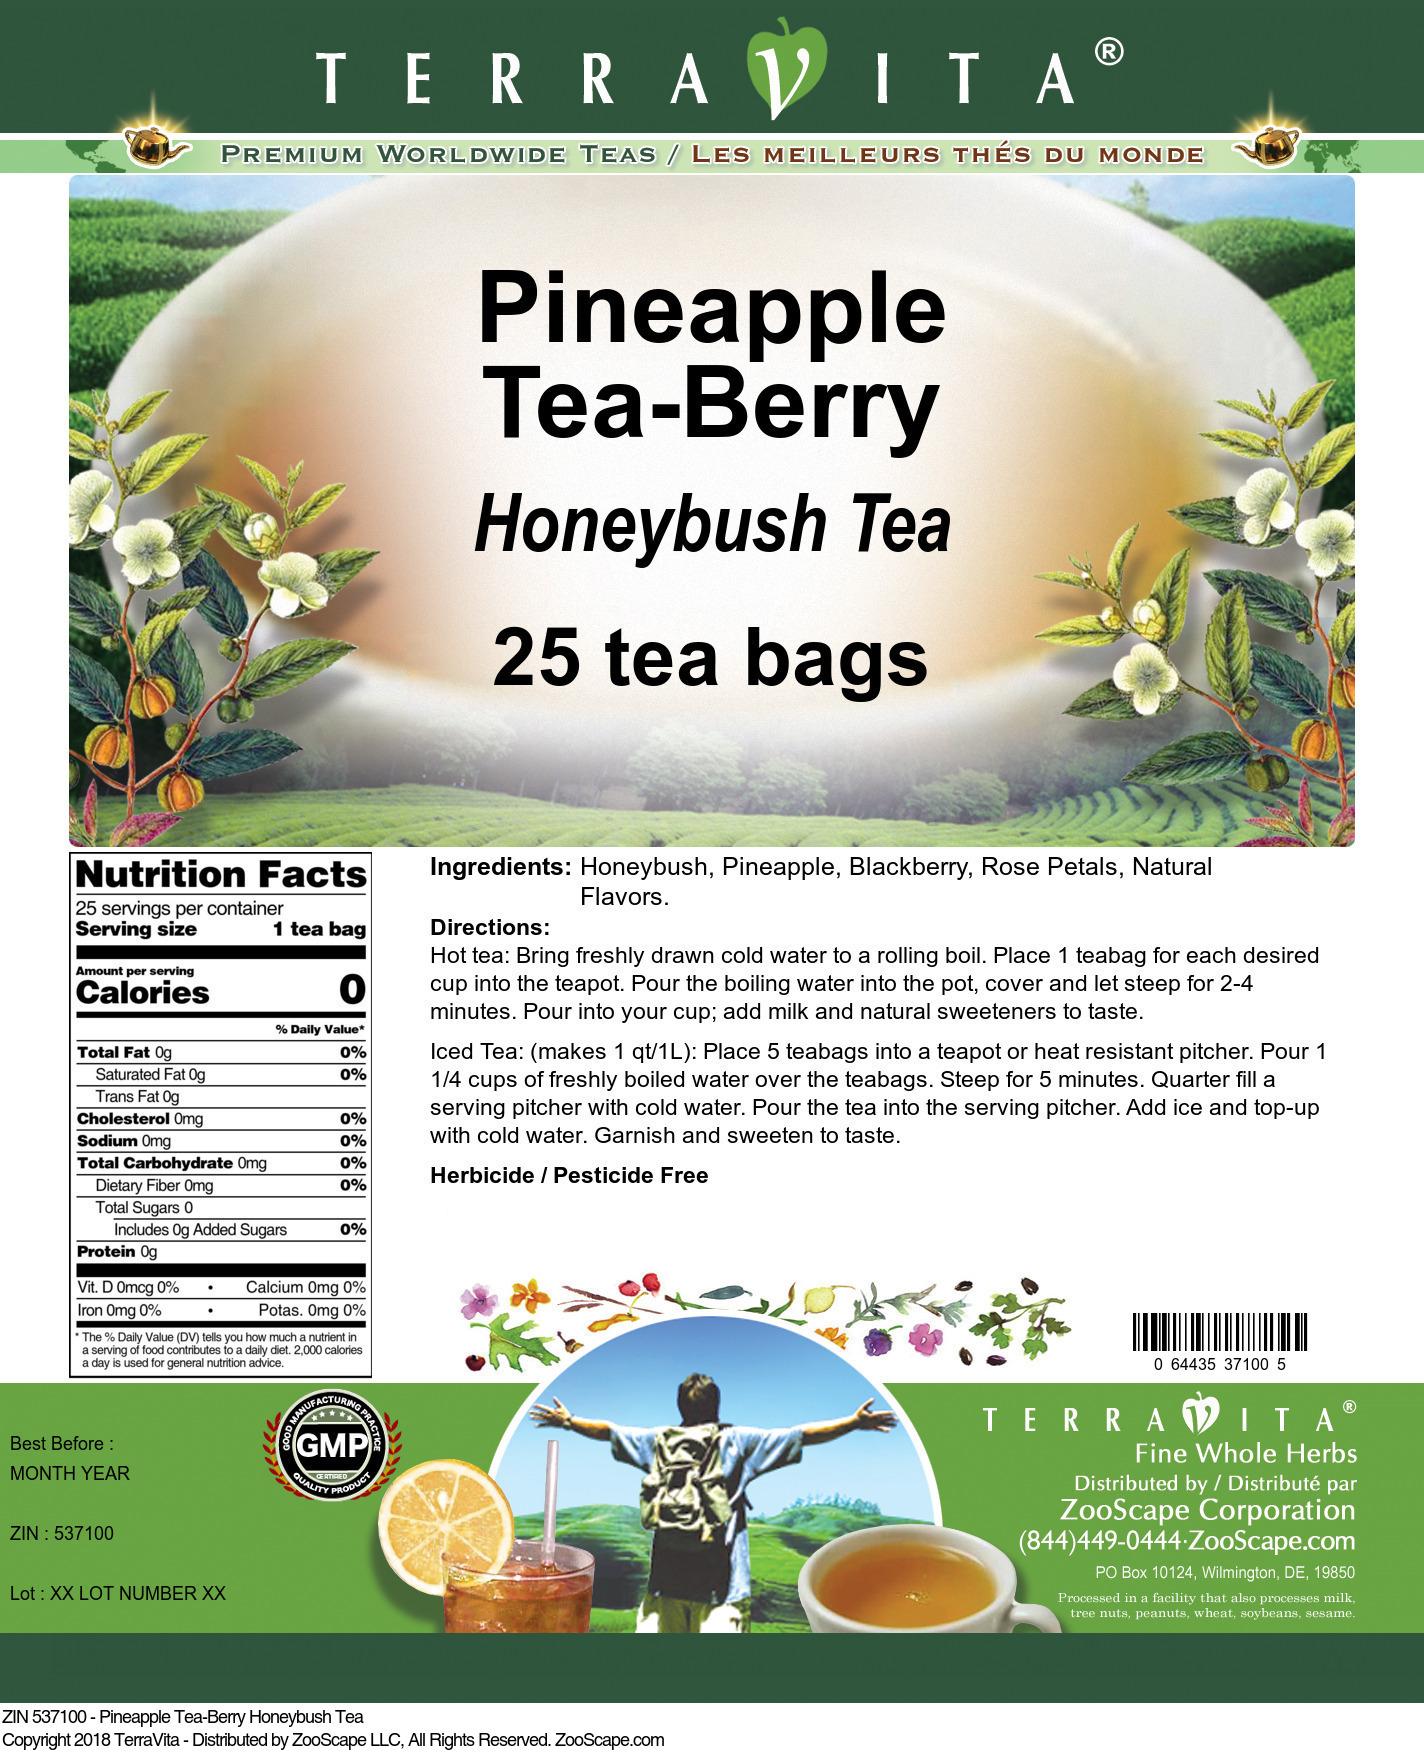 Pineapple Tea-Berry Honeybush Tea